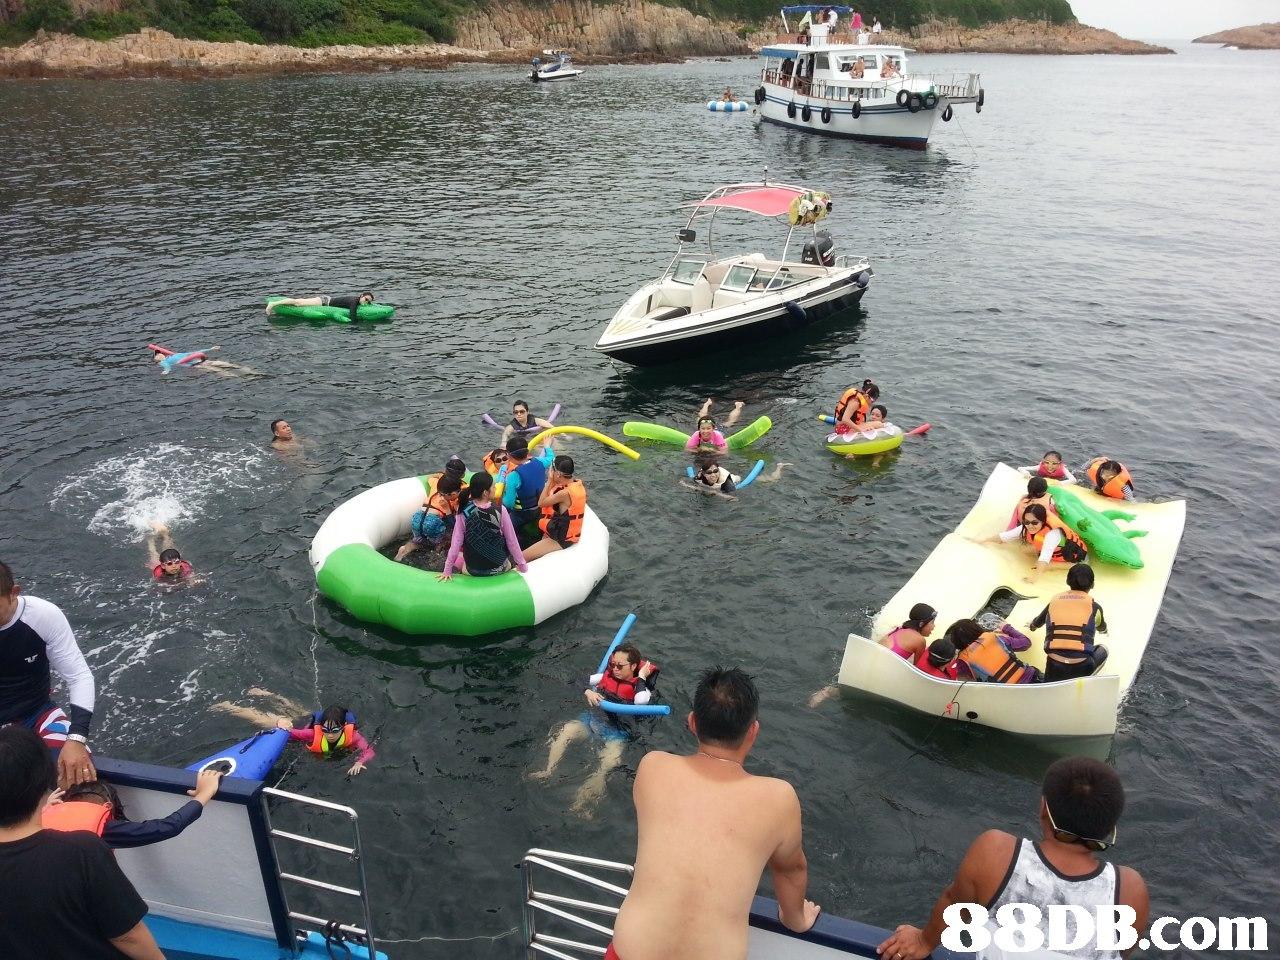 Water transportation,Vehicle,Recreation,Boat,Boating